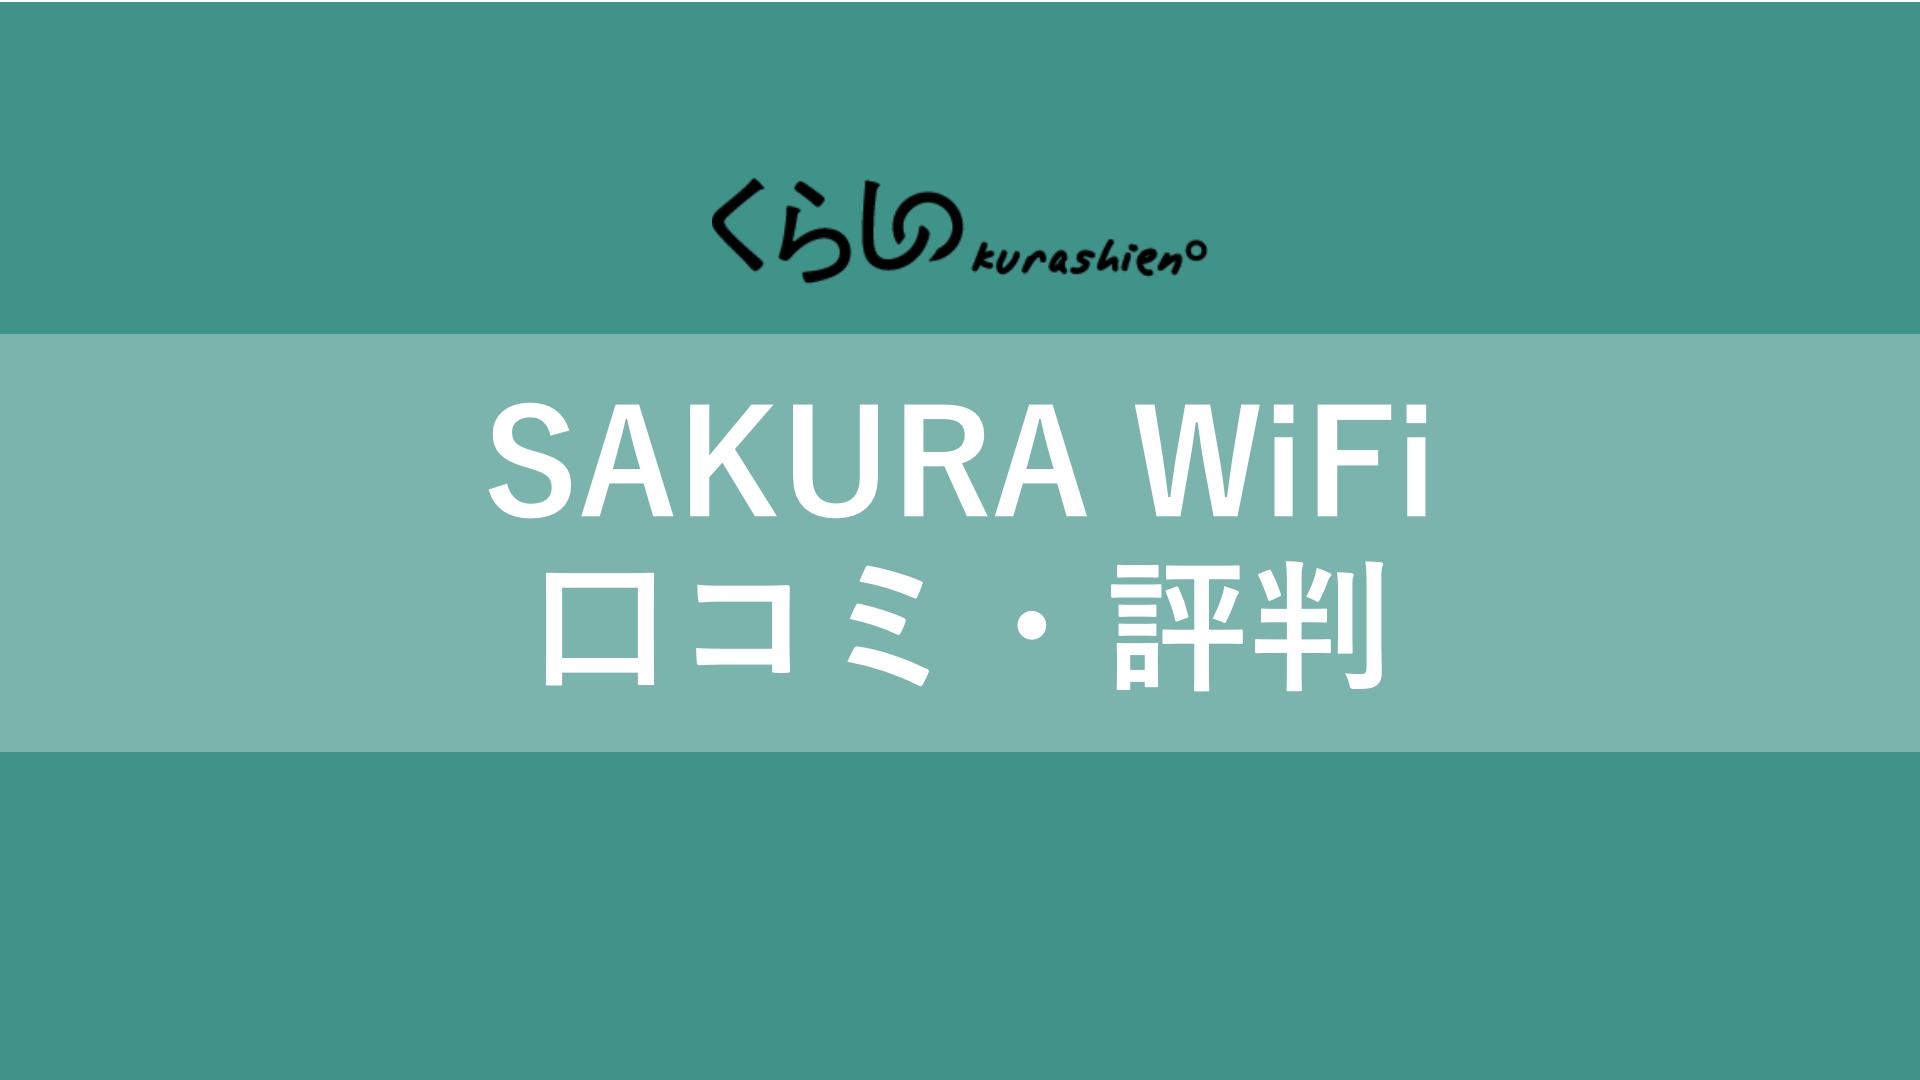 SAKURA WiFi、口コミ・評判は?デメリットは?モバイルWiFiの選び方